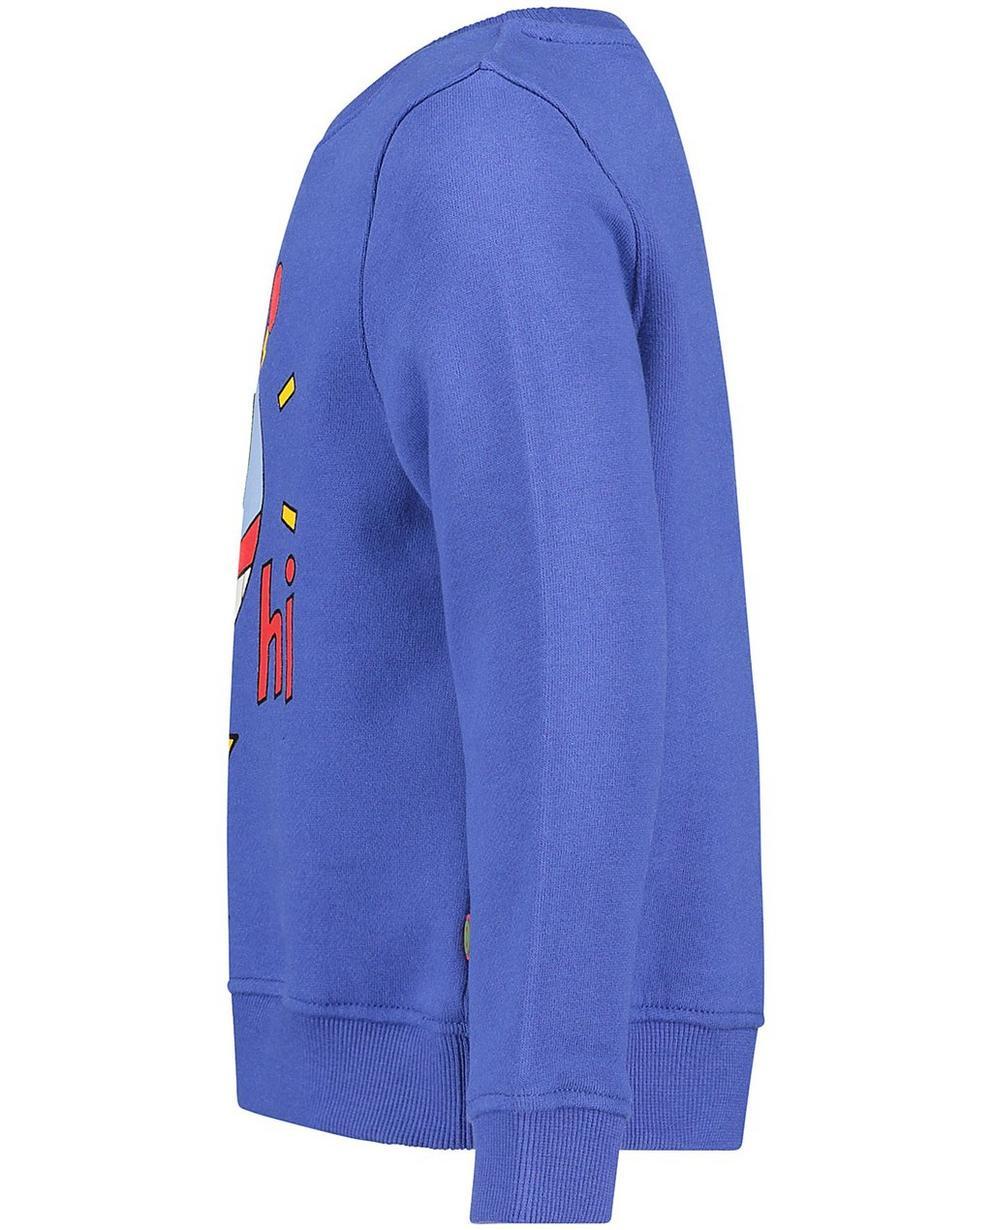 Sweats - navy - Sweat bleu lavande